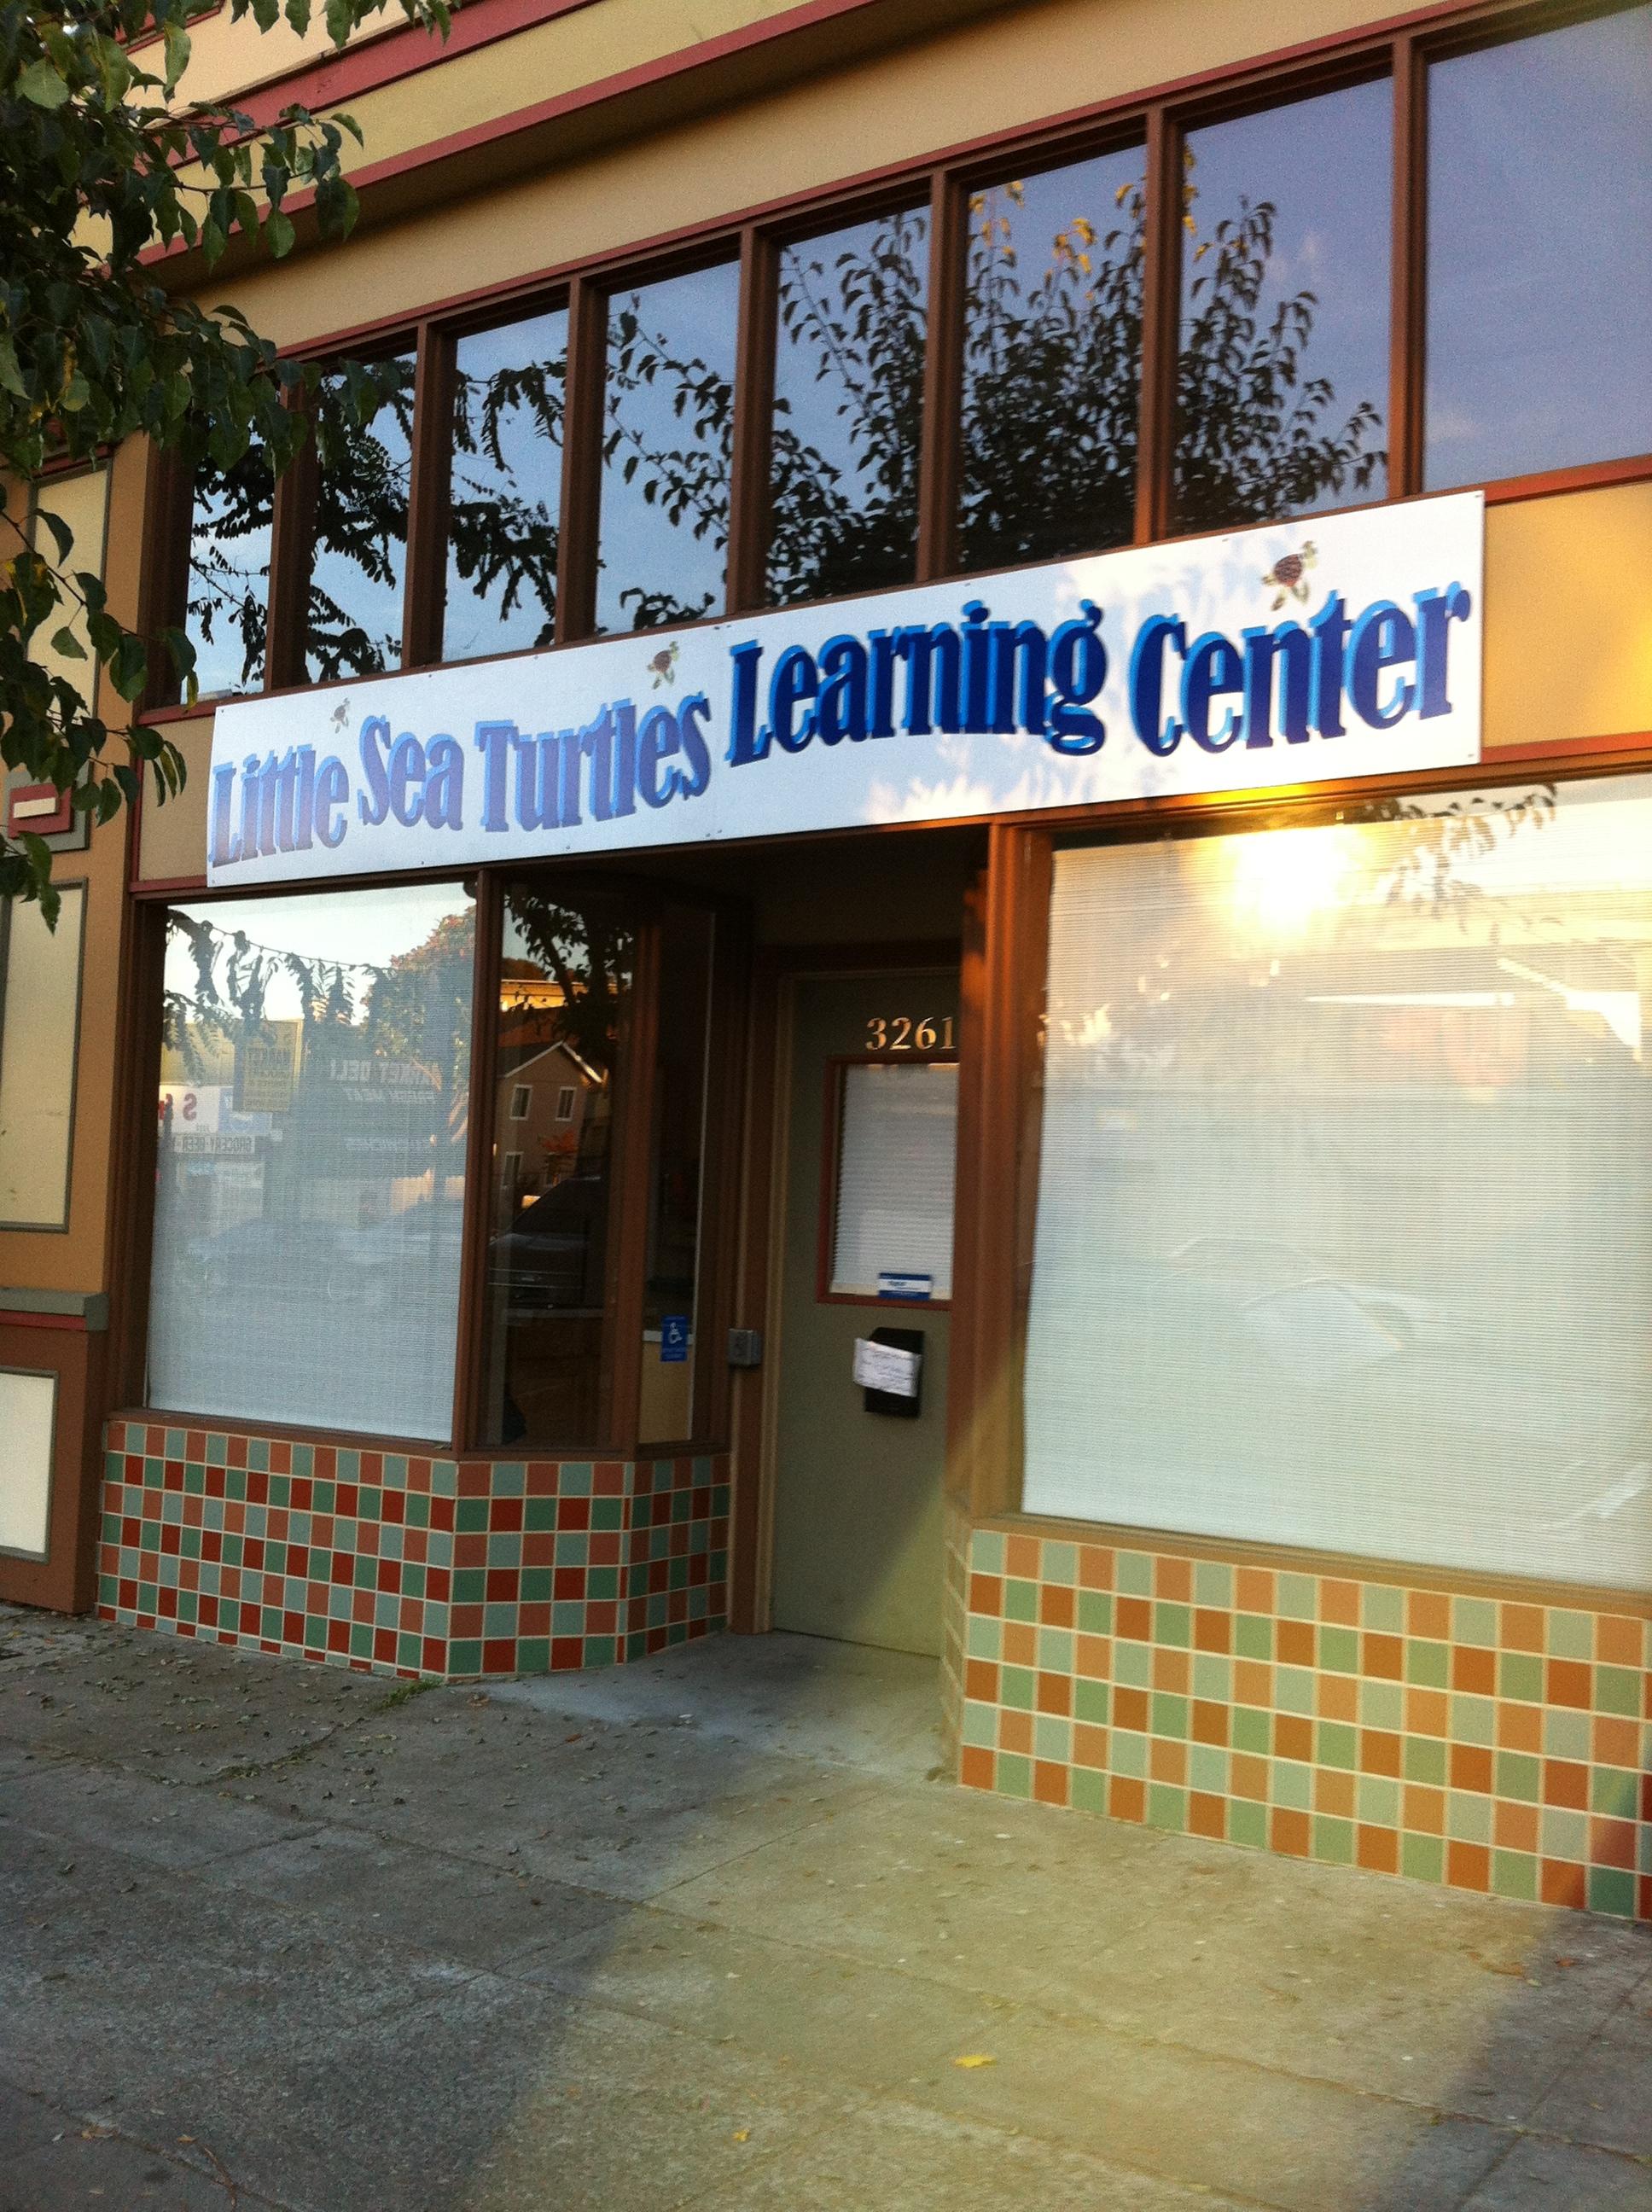 Little Sea Turtles Learning Center